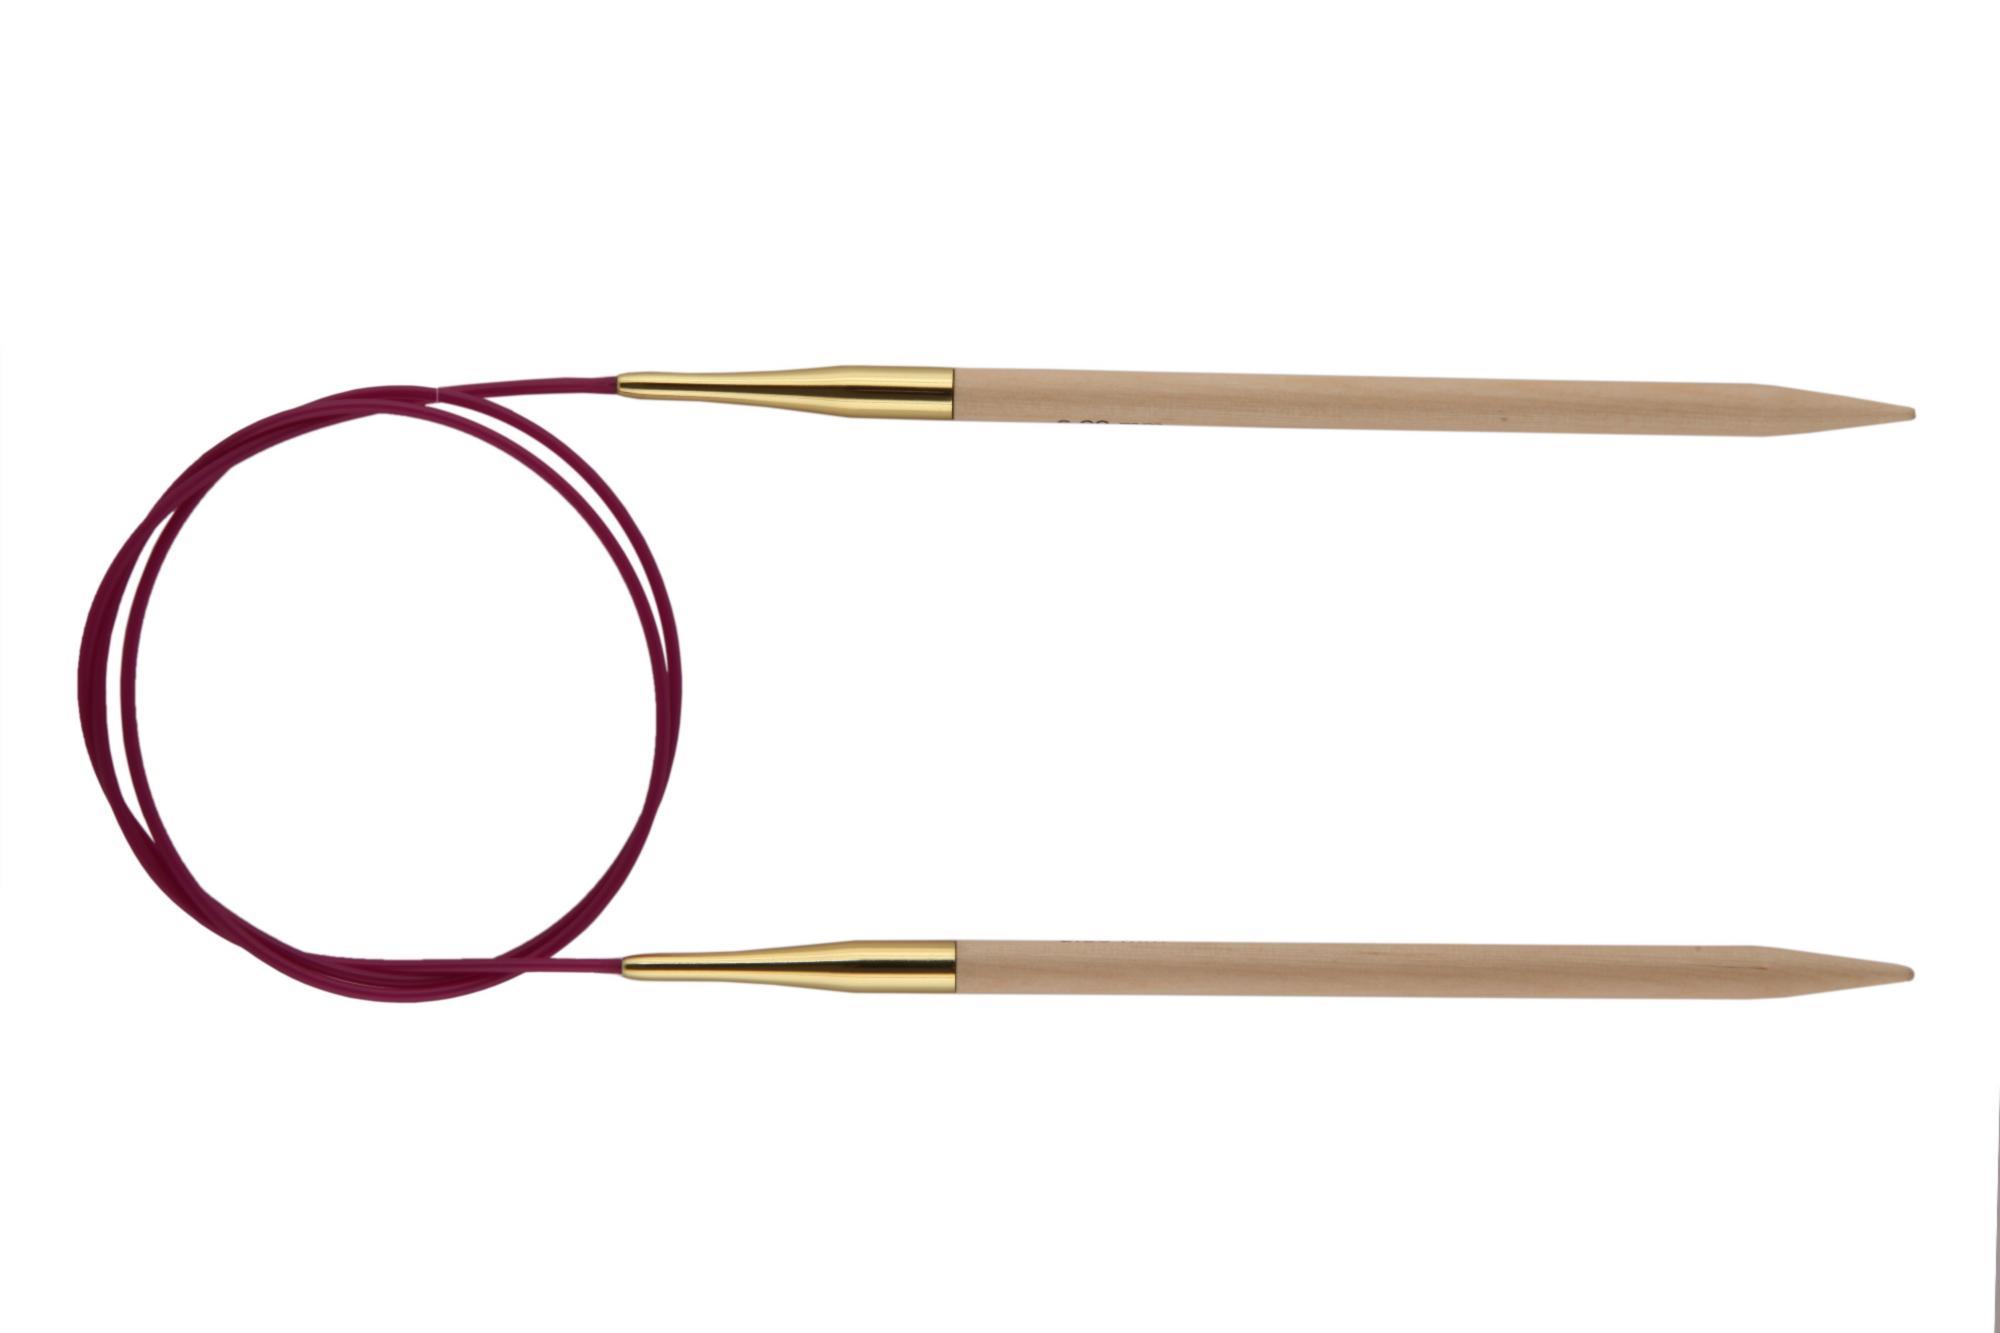 Спицы круговые 40 см Basix Birch Wood KnitPro, 35309, 4.50 мм